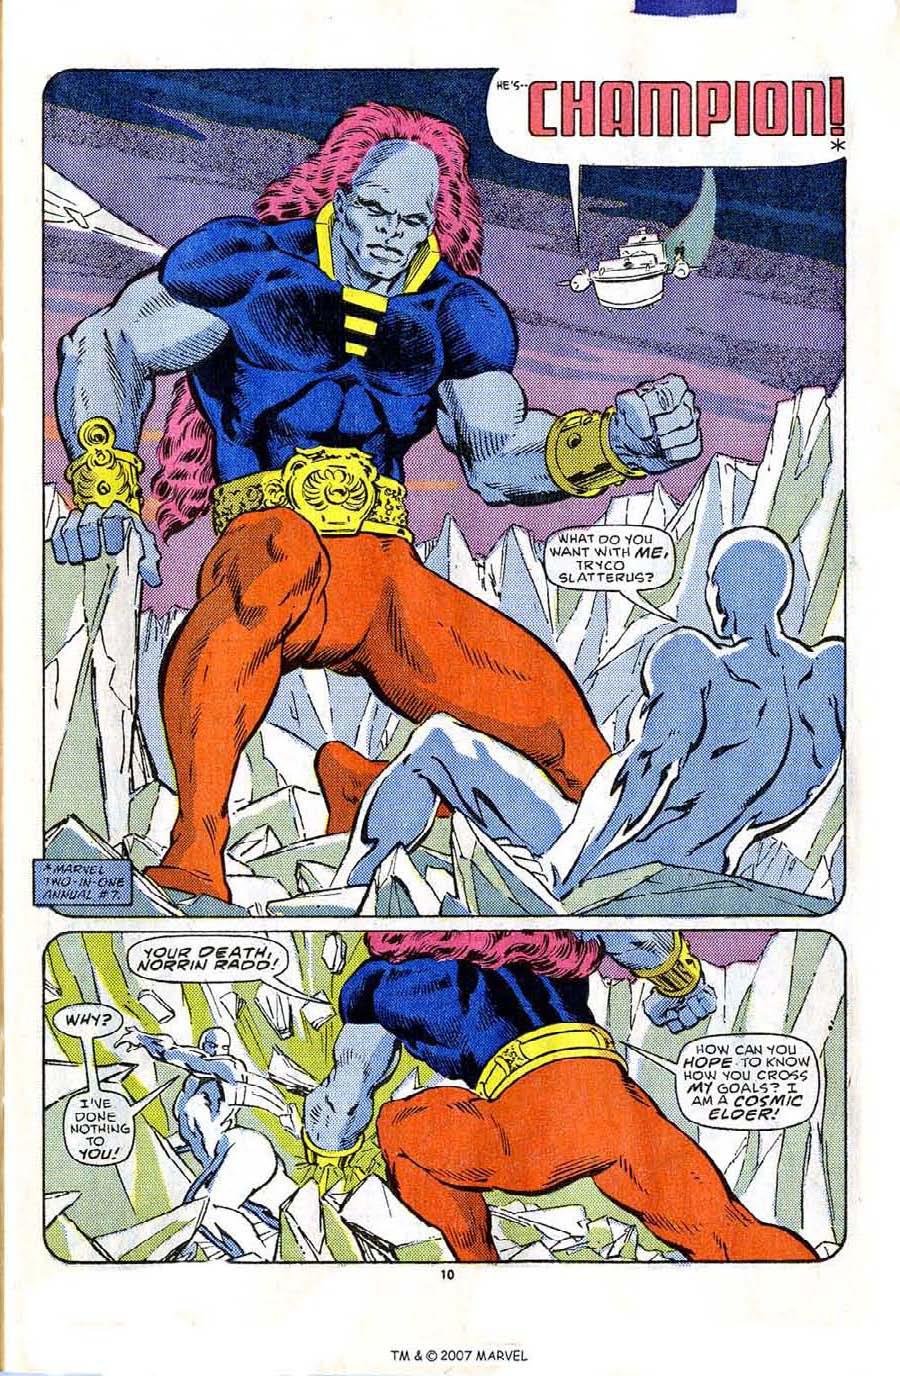 Silver Surfer (1987) #1 pg10, lettered by John Workman.